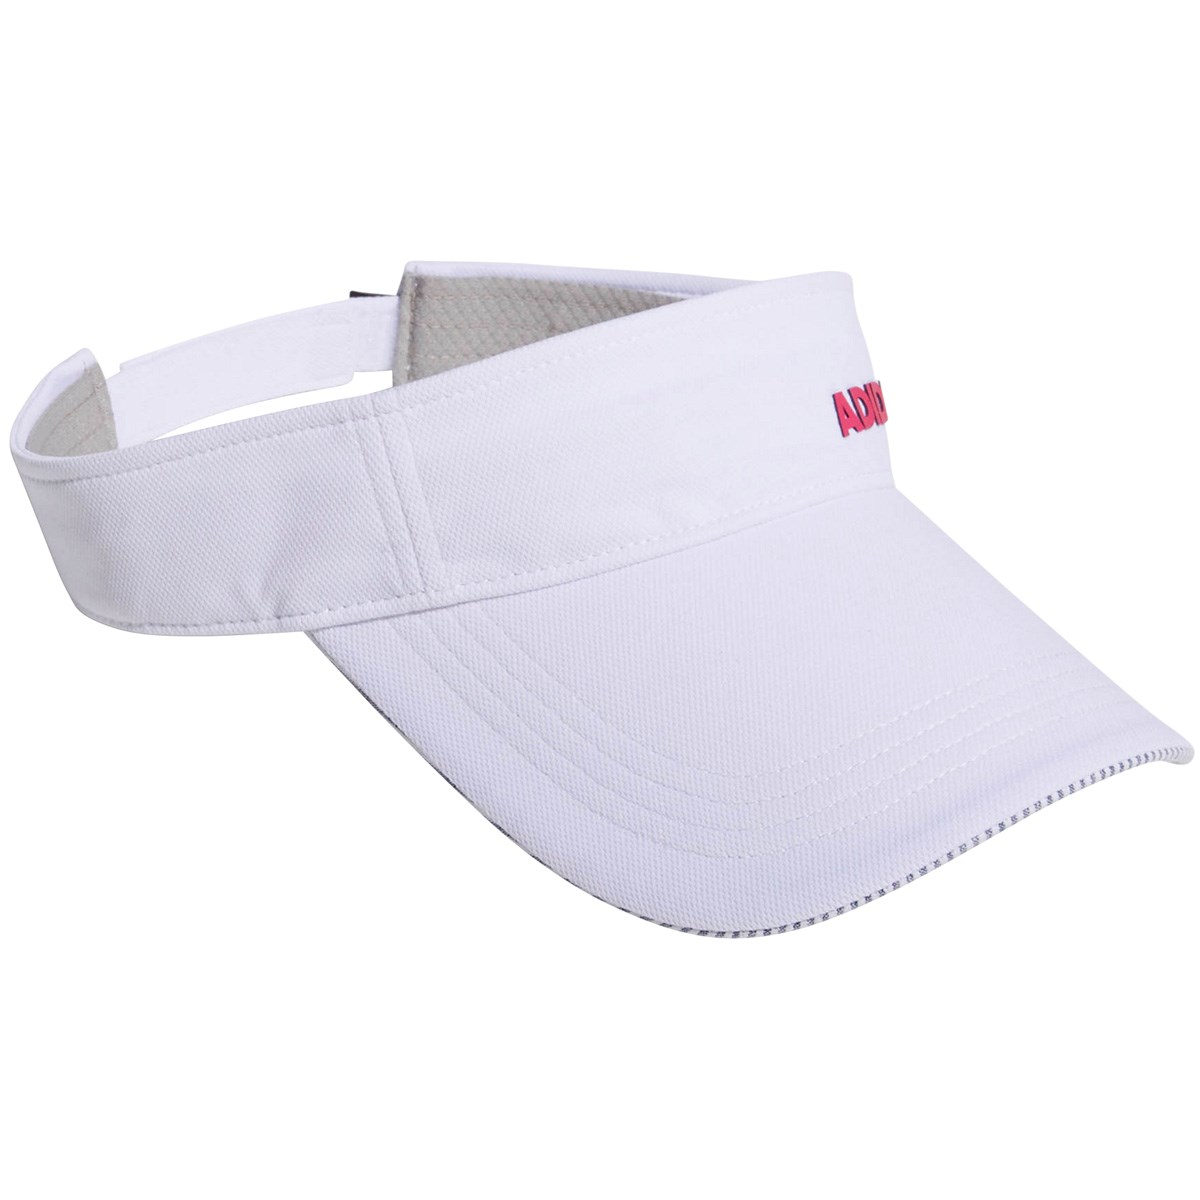 61db6b1e893323 [2019年モデル] アディダス adidas ADICROSS ロゴサンバイザー ホワイト レディース ゴルフウェア .